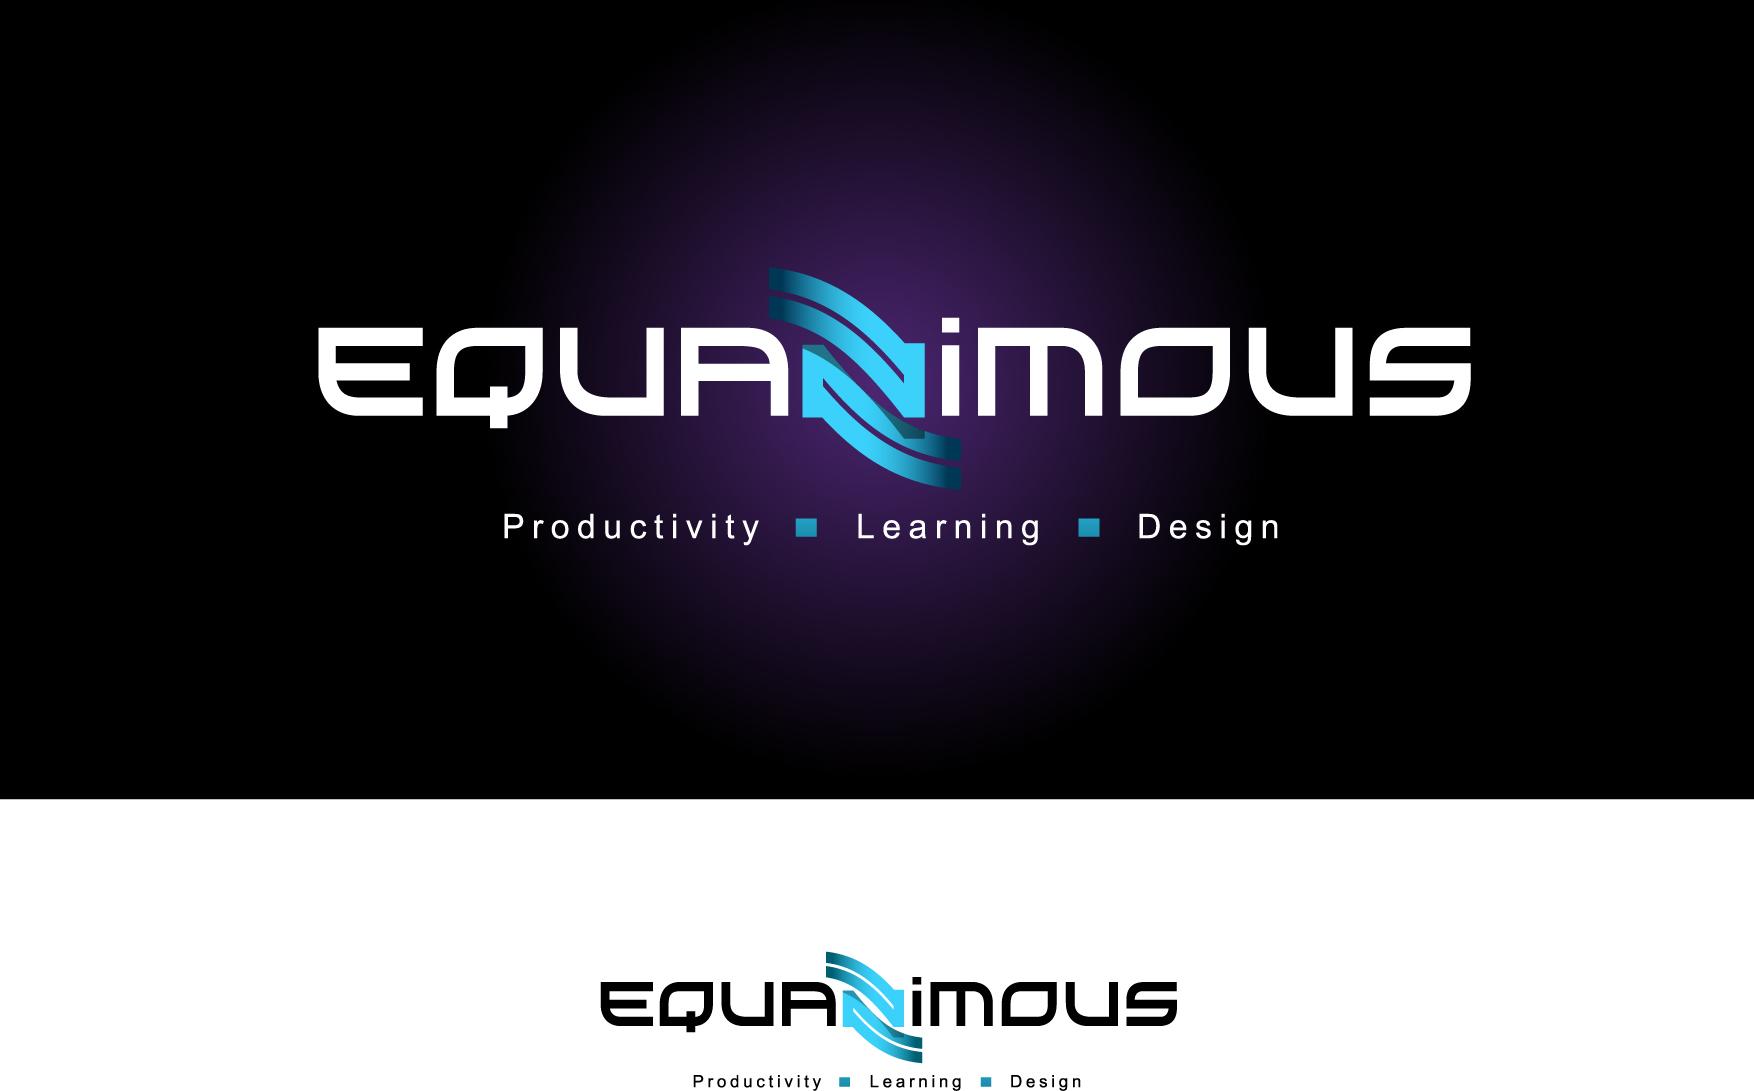 Logo Design by Wilfredo Mendoza - Entry No. 435 in the Logo Design Contest Logo Design : EQUANIMOUS : Productivity | Learning | Design.